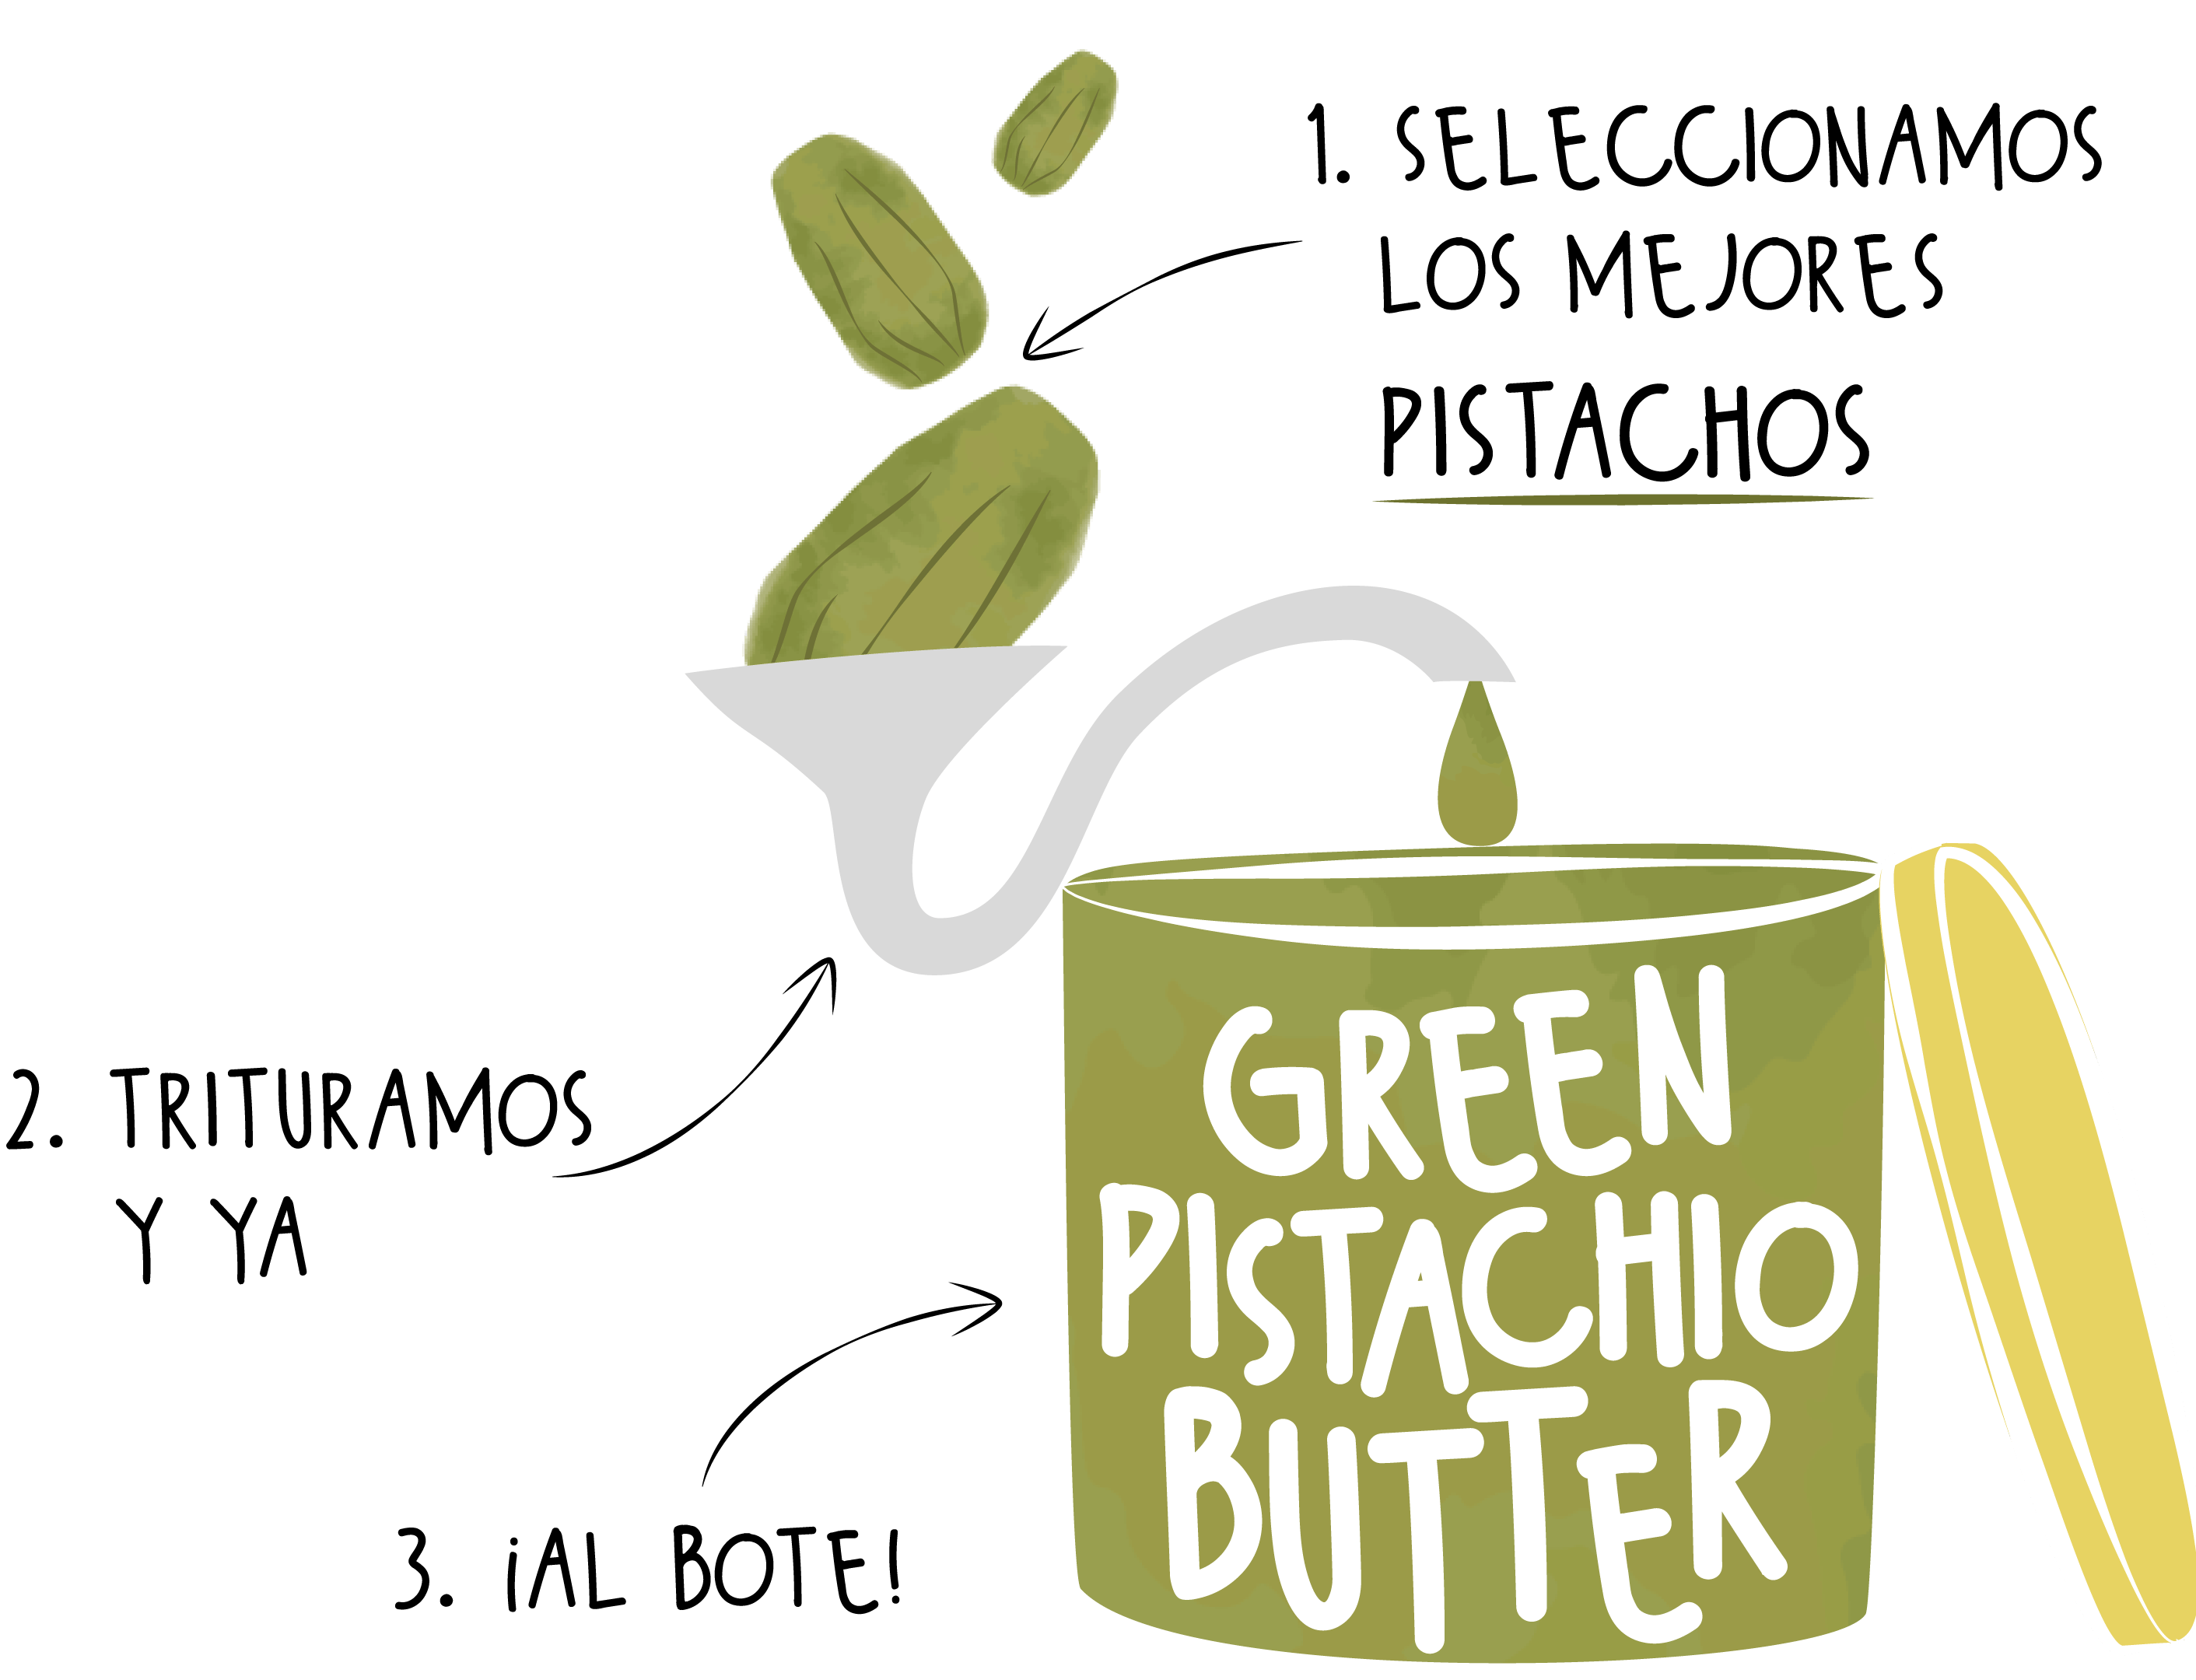 Crema de pistacho | The Nut Club